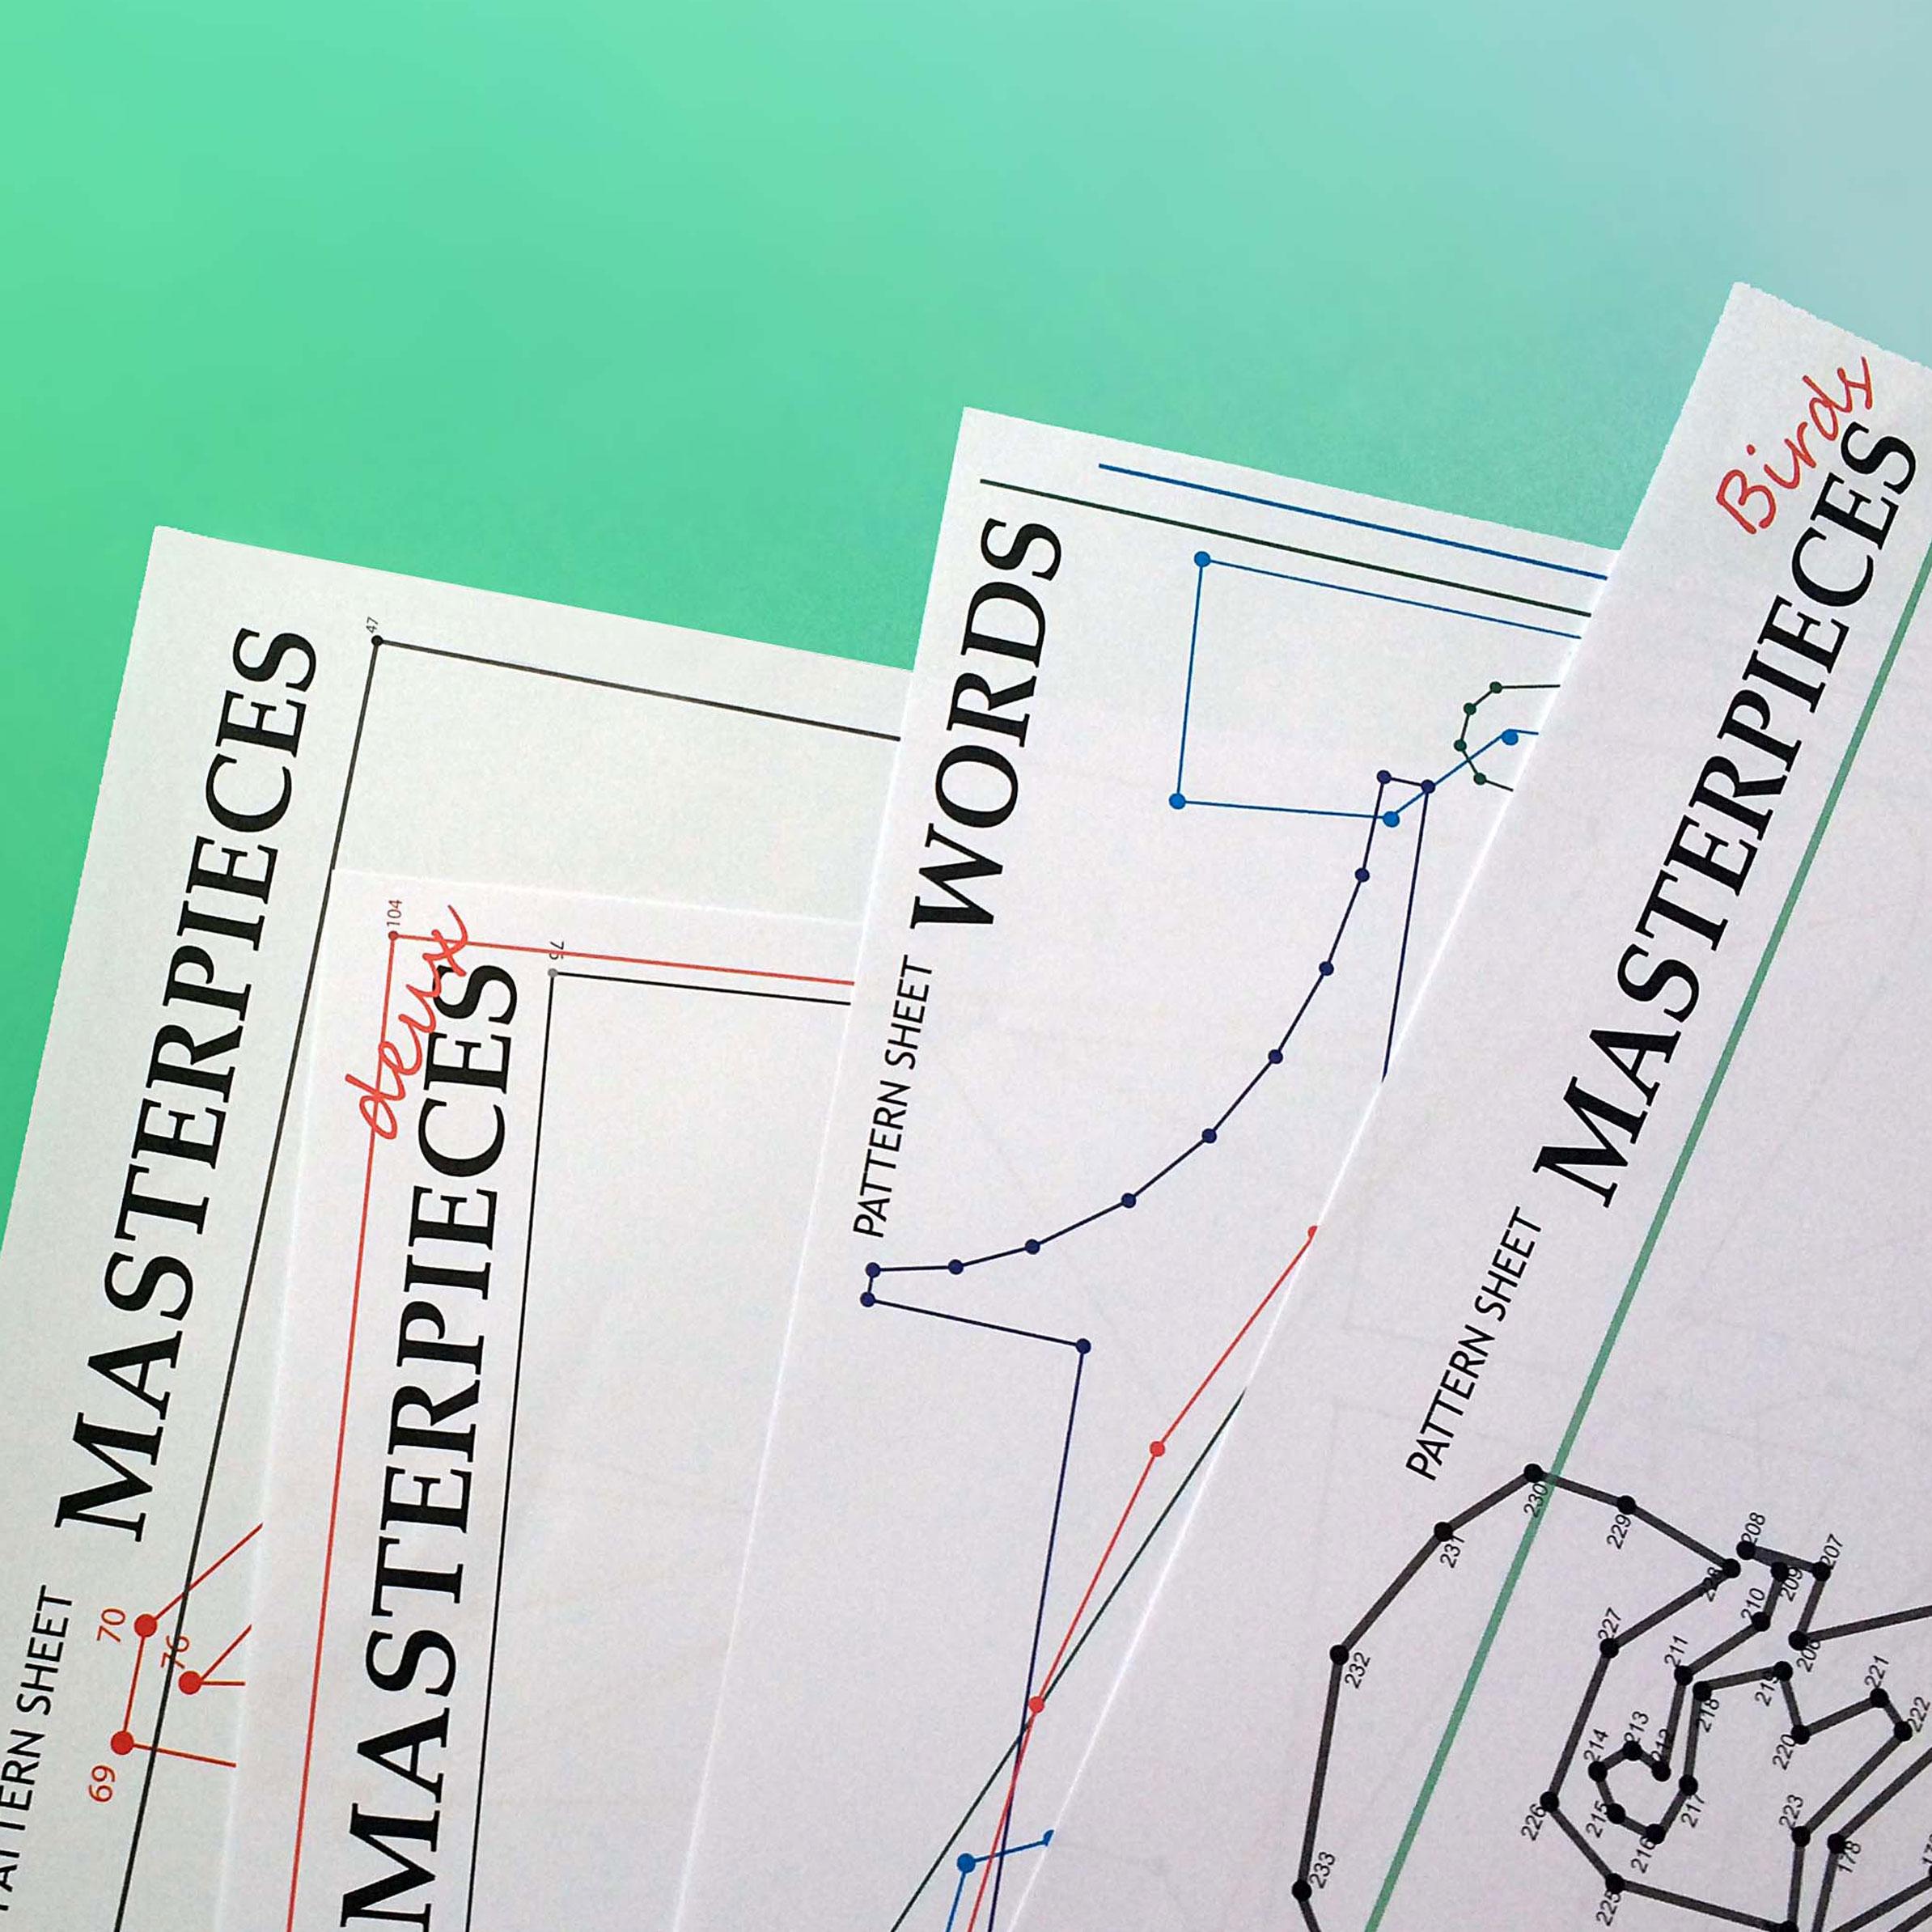 PatternSheets